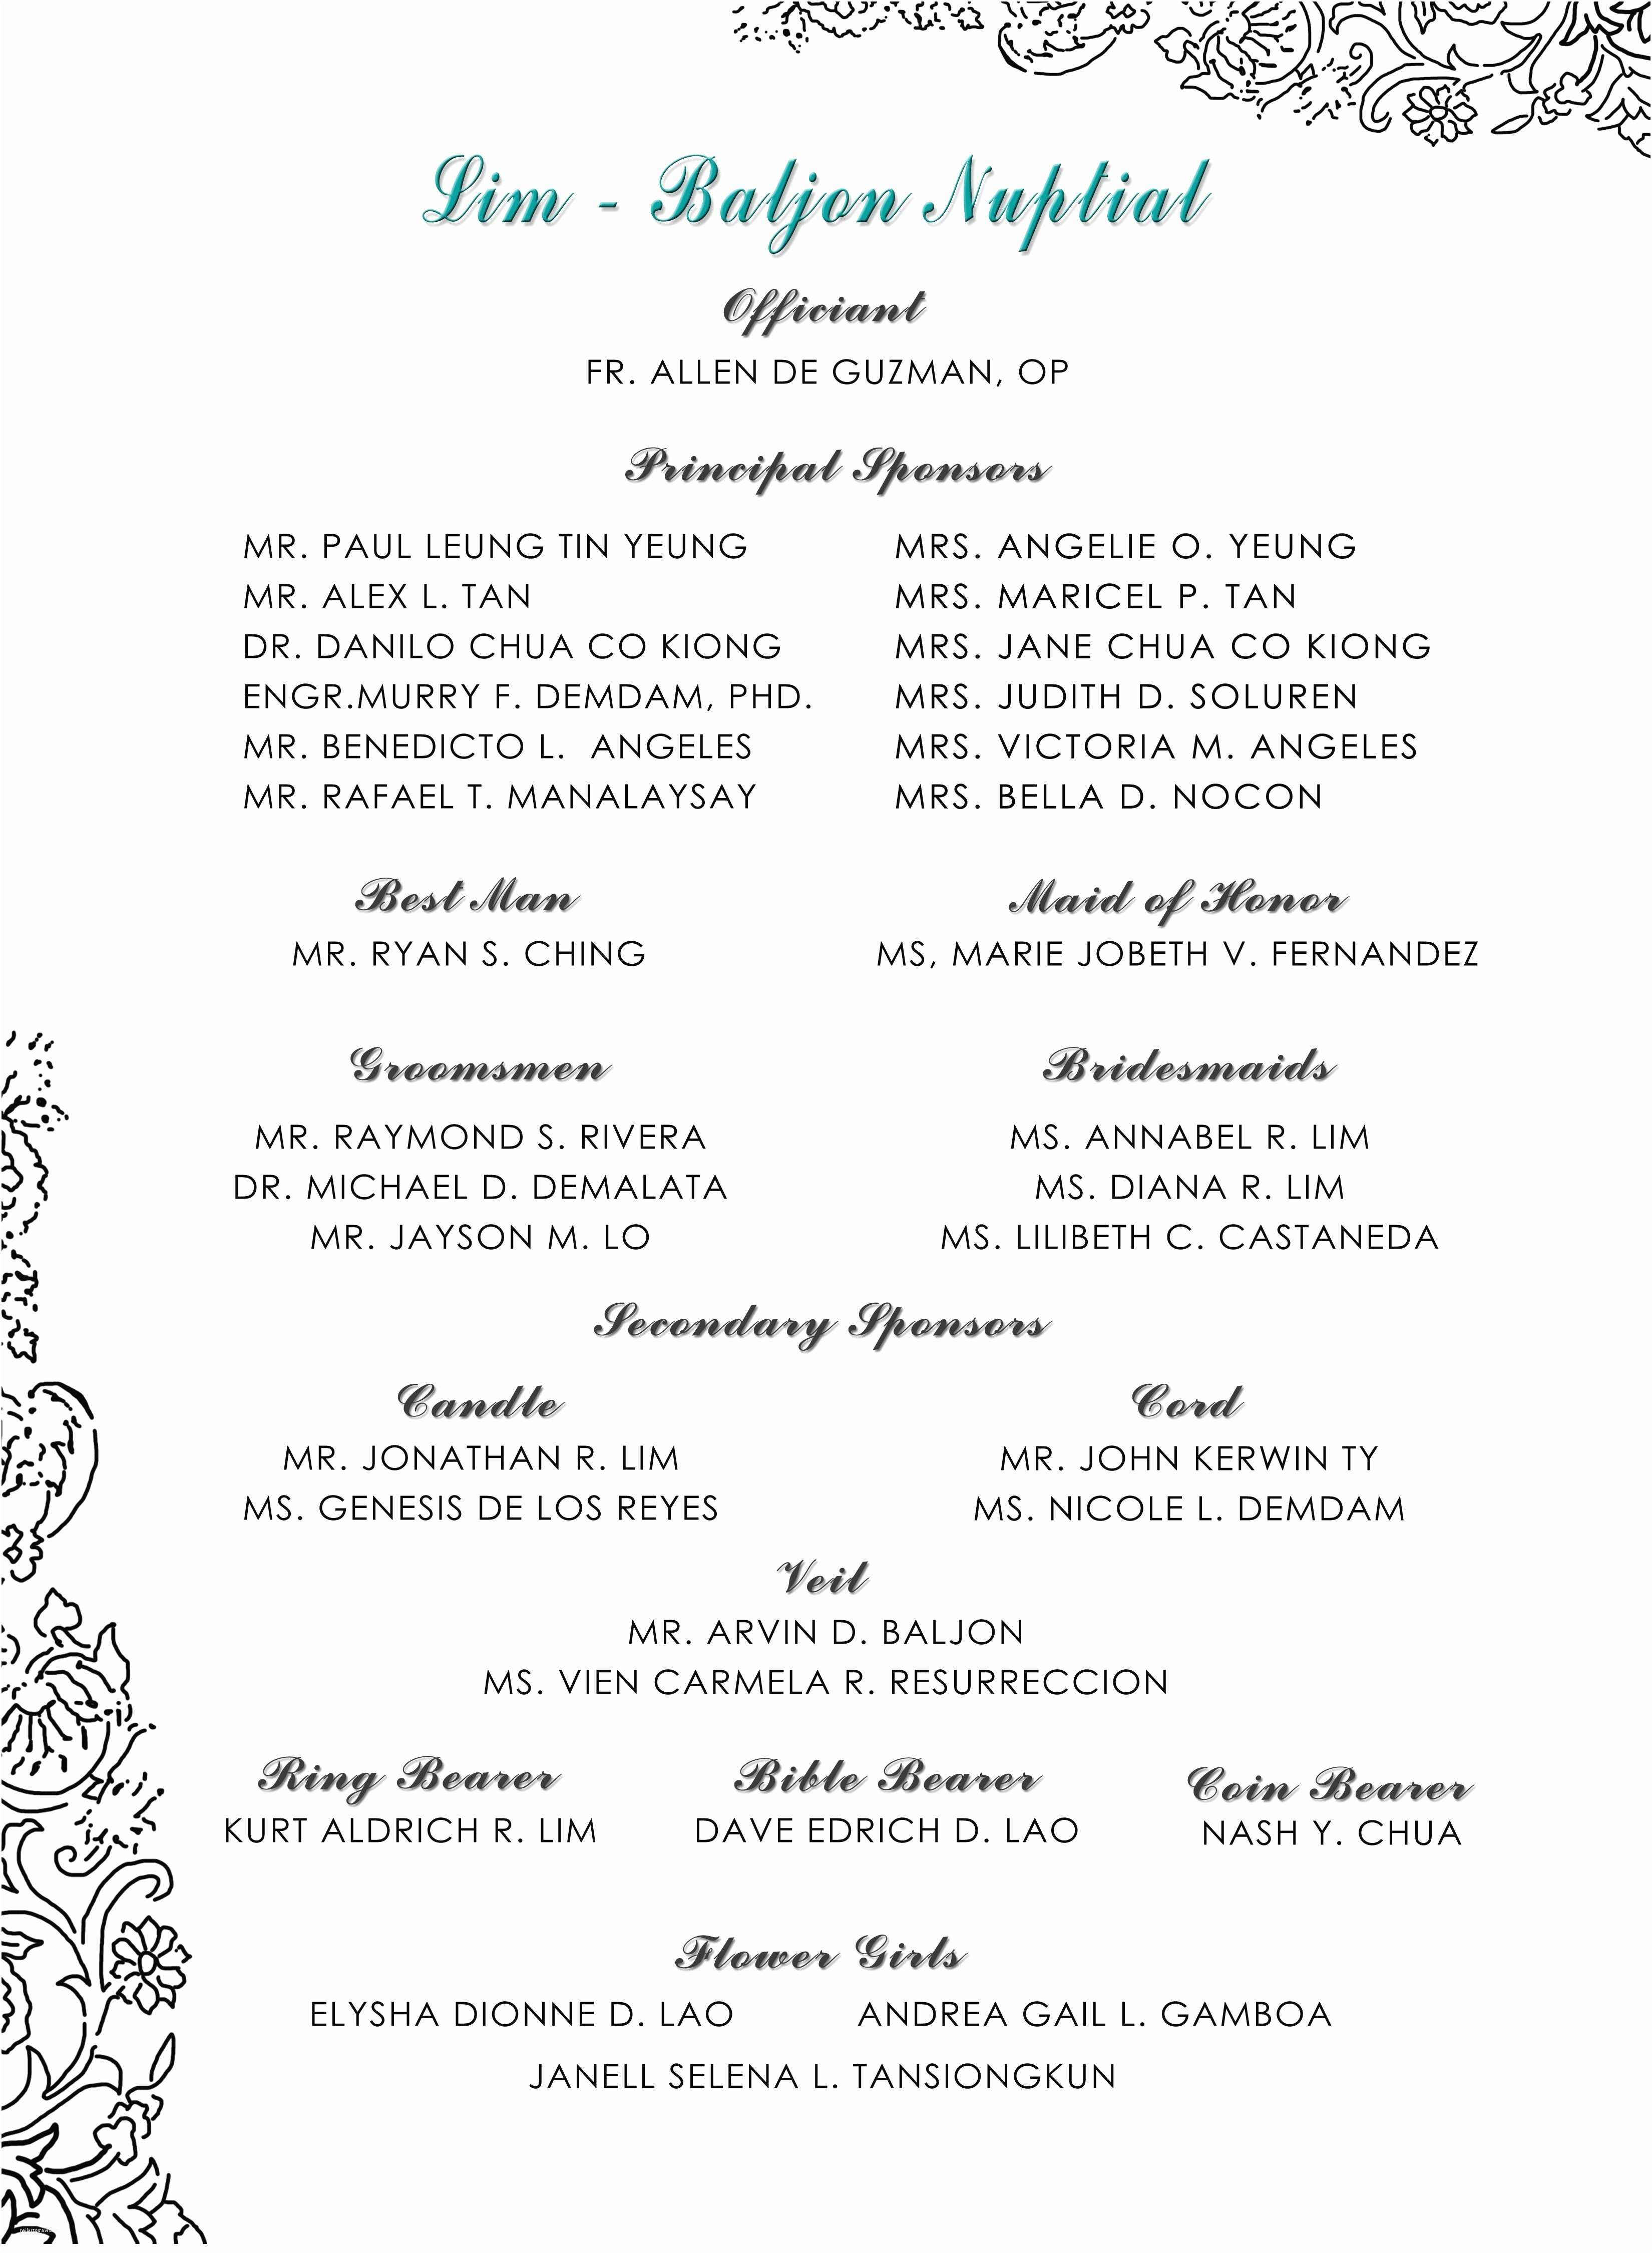 Filipino Wedding Invitation Sample Sample Wedding Invitation Cards In the Philippines